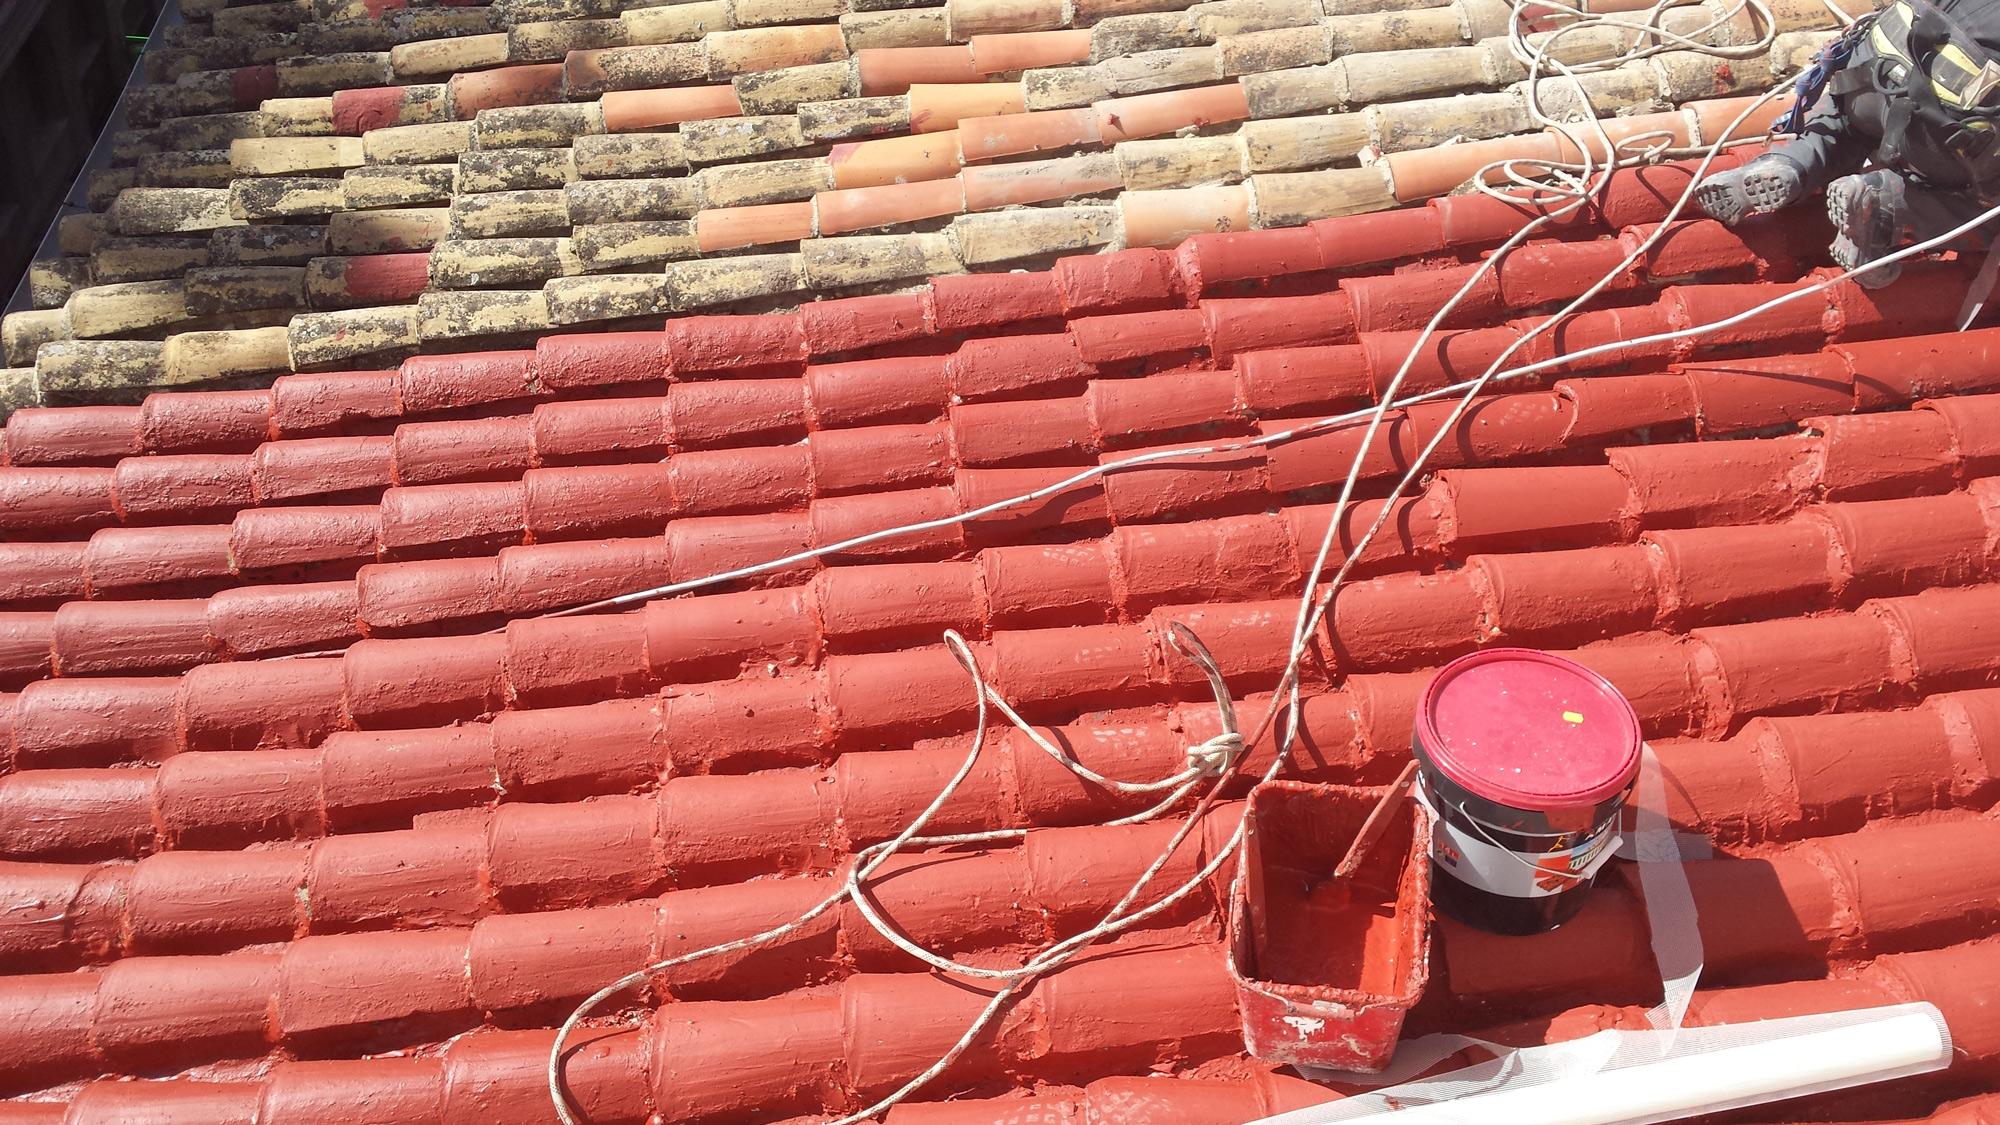 Rehabilitaci n impermeabilizaci n cubiertas tejados alicante - Impermeabilizacion de tejados ...